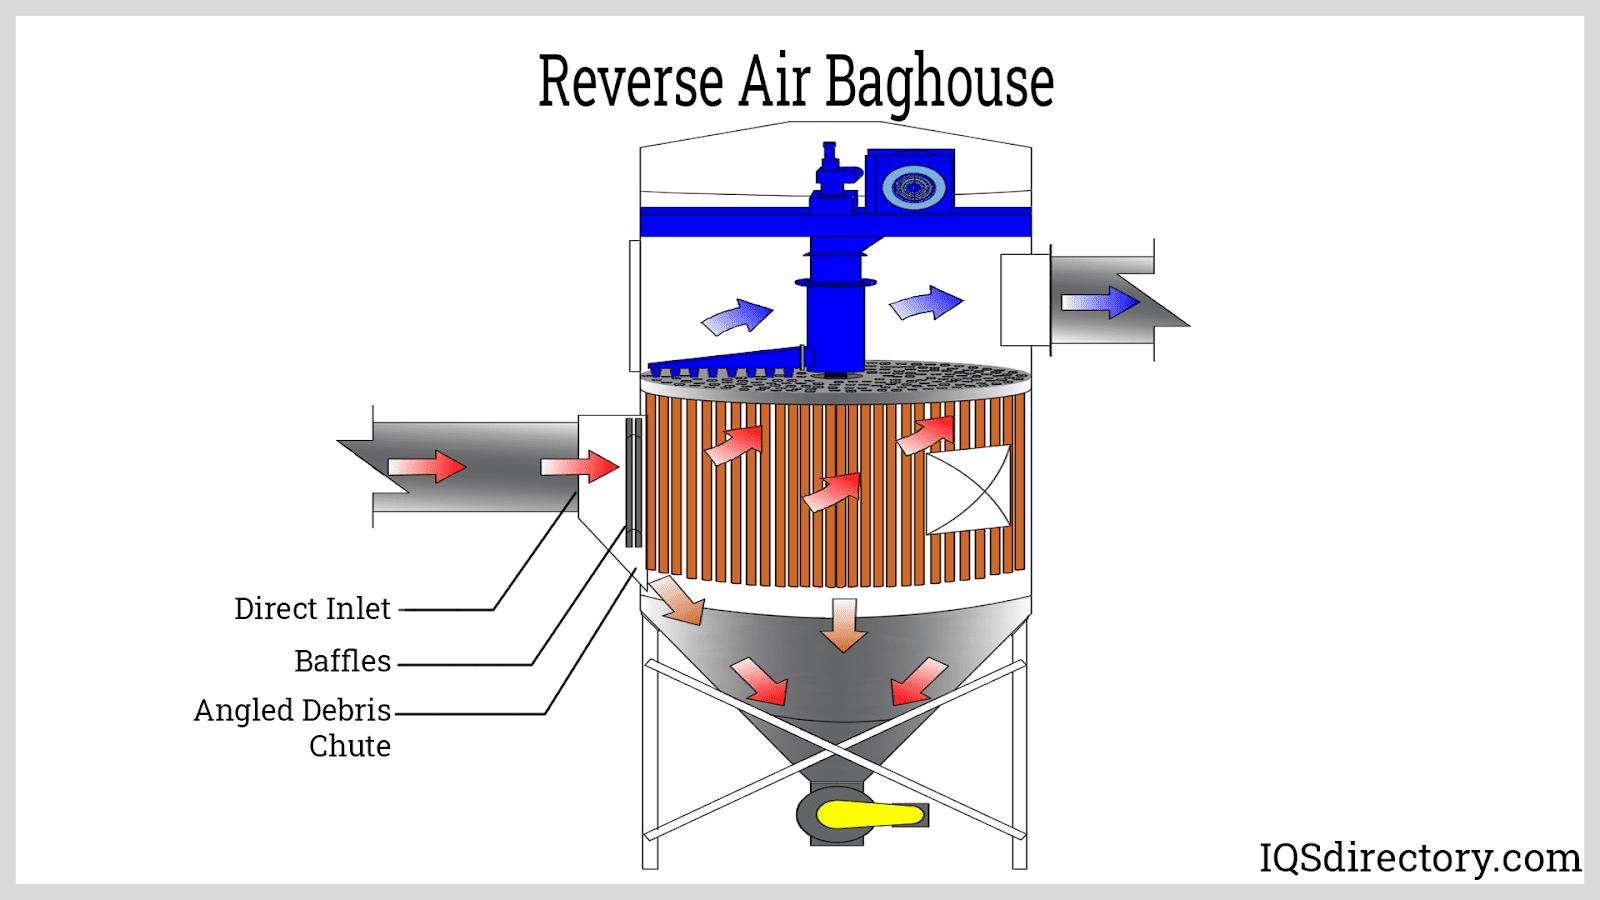 Reverse Air Baghouse